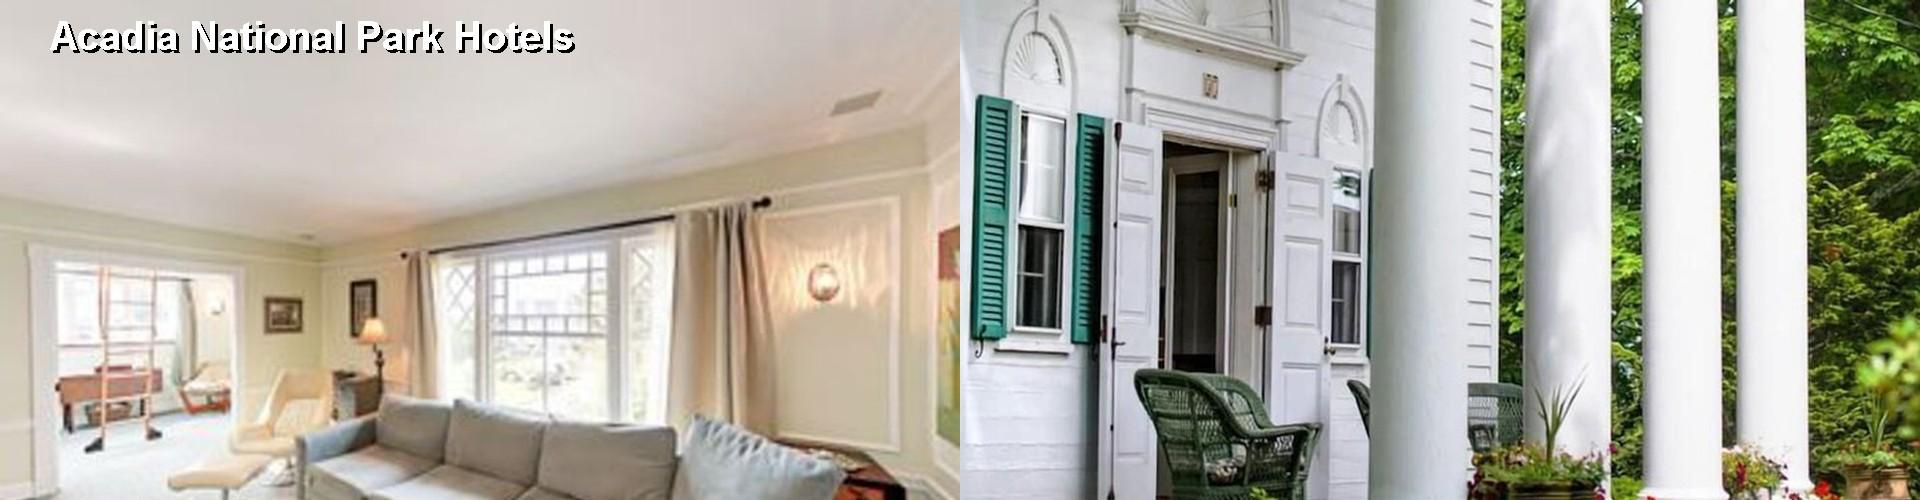 5 Best Hotels Near Acadia National Park